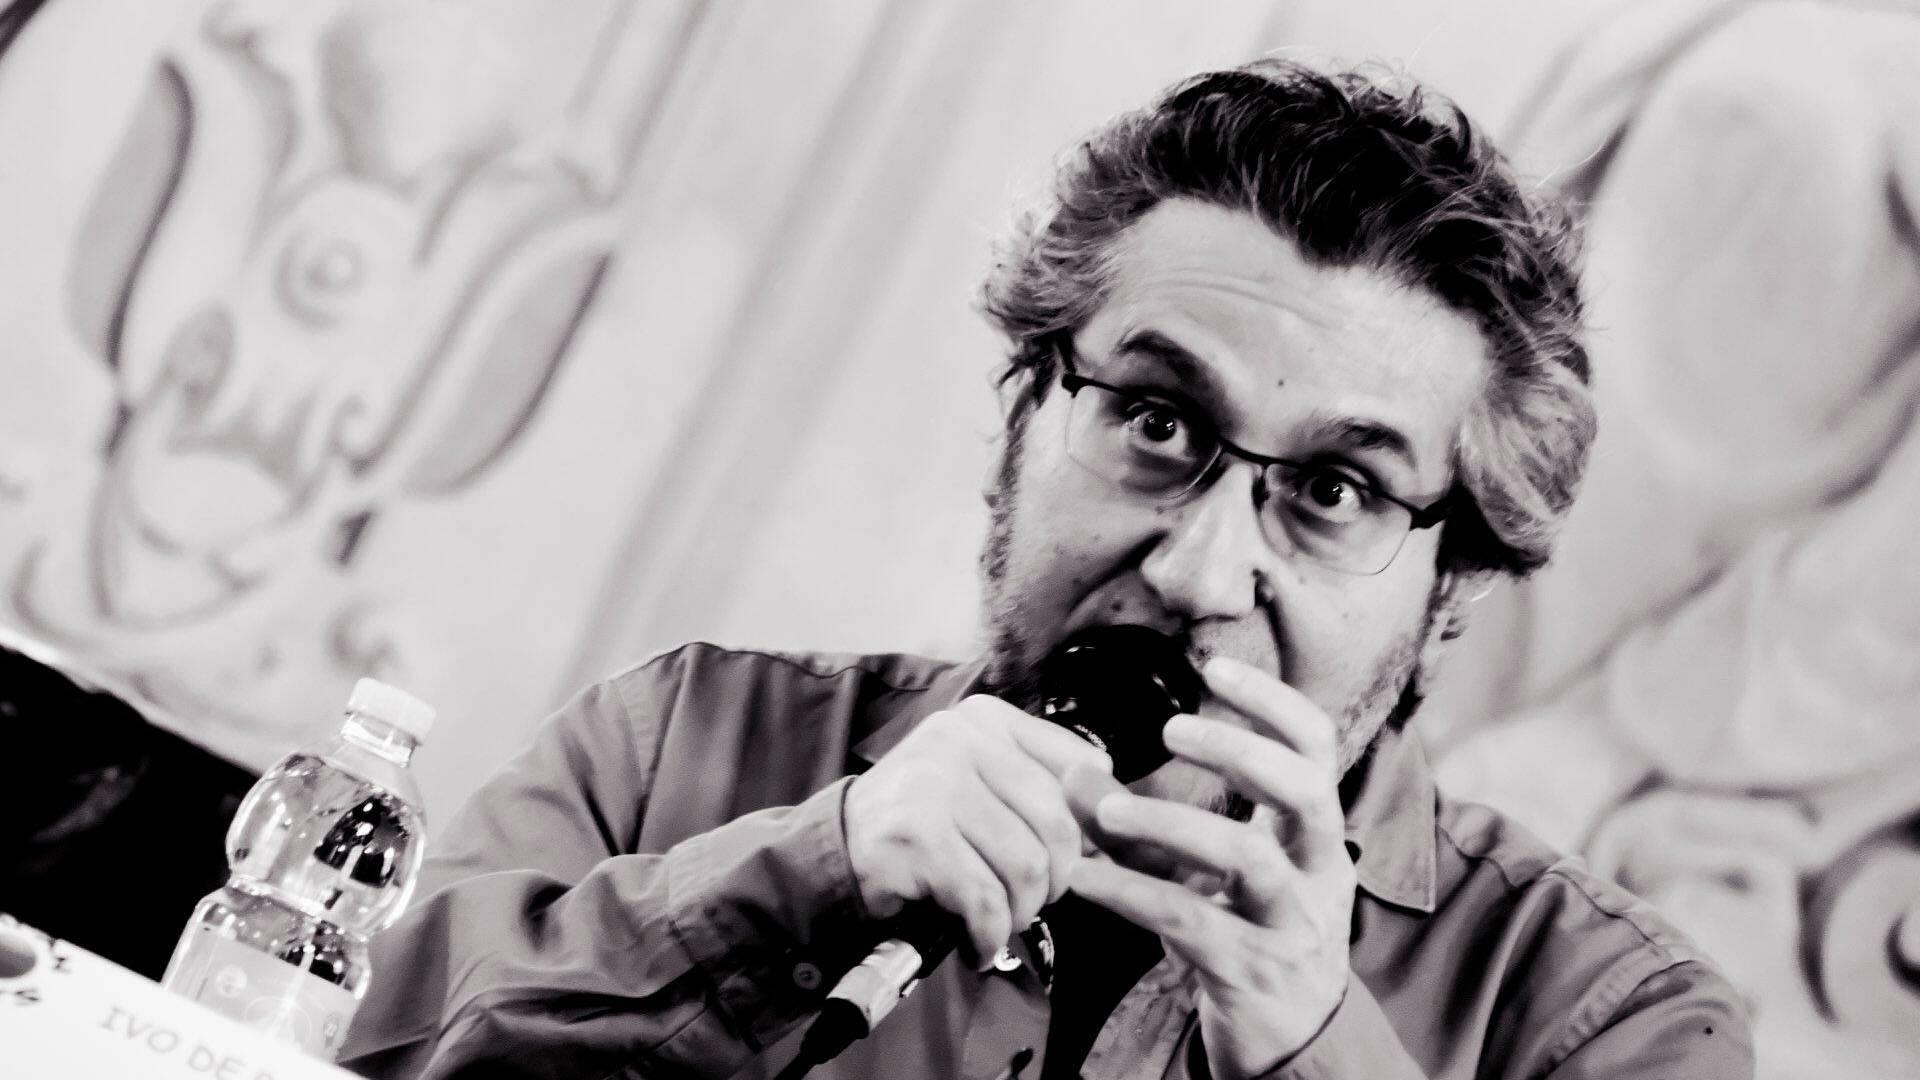 Ivo De Palma